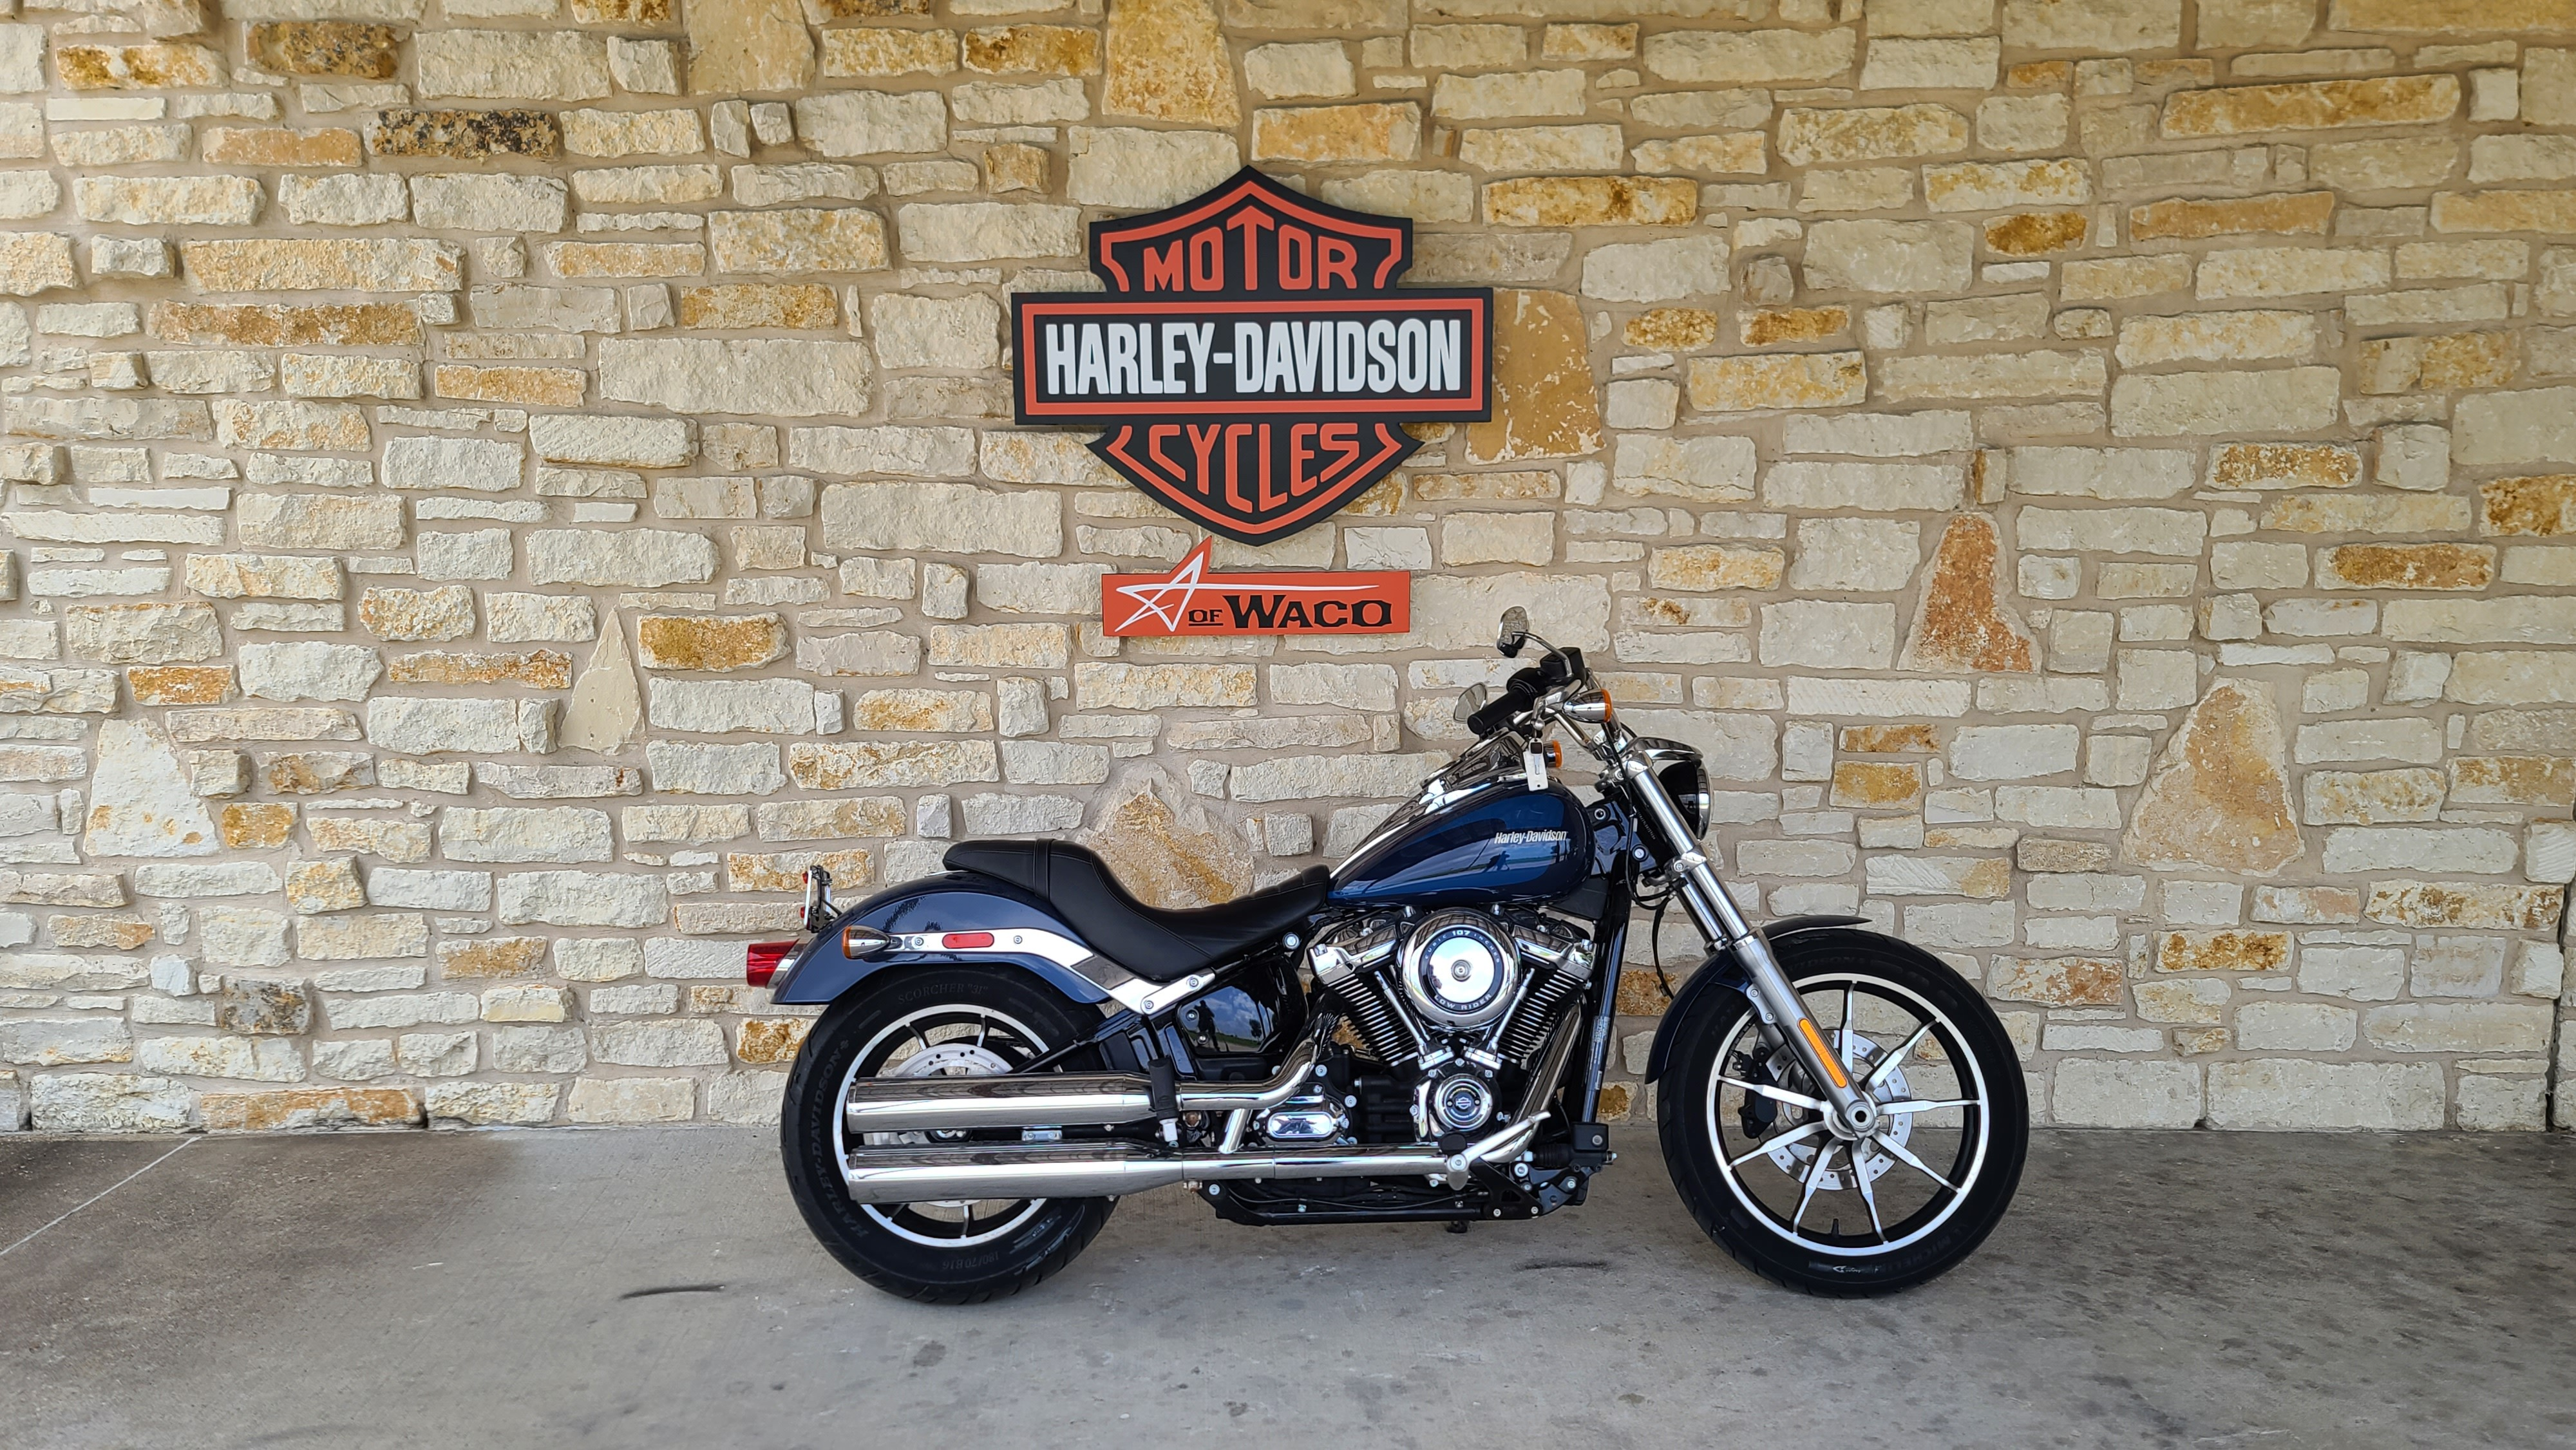 2020 Harley-Davidson Softail Low Rider at Harley-Davidson of Waco